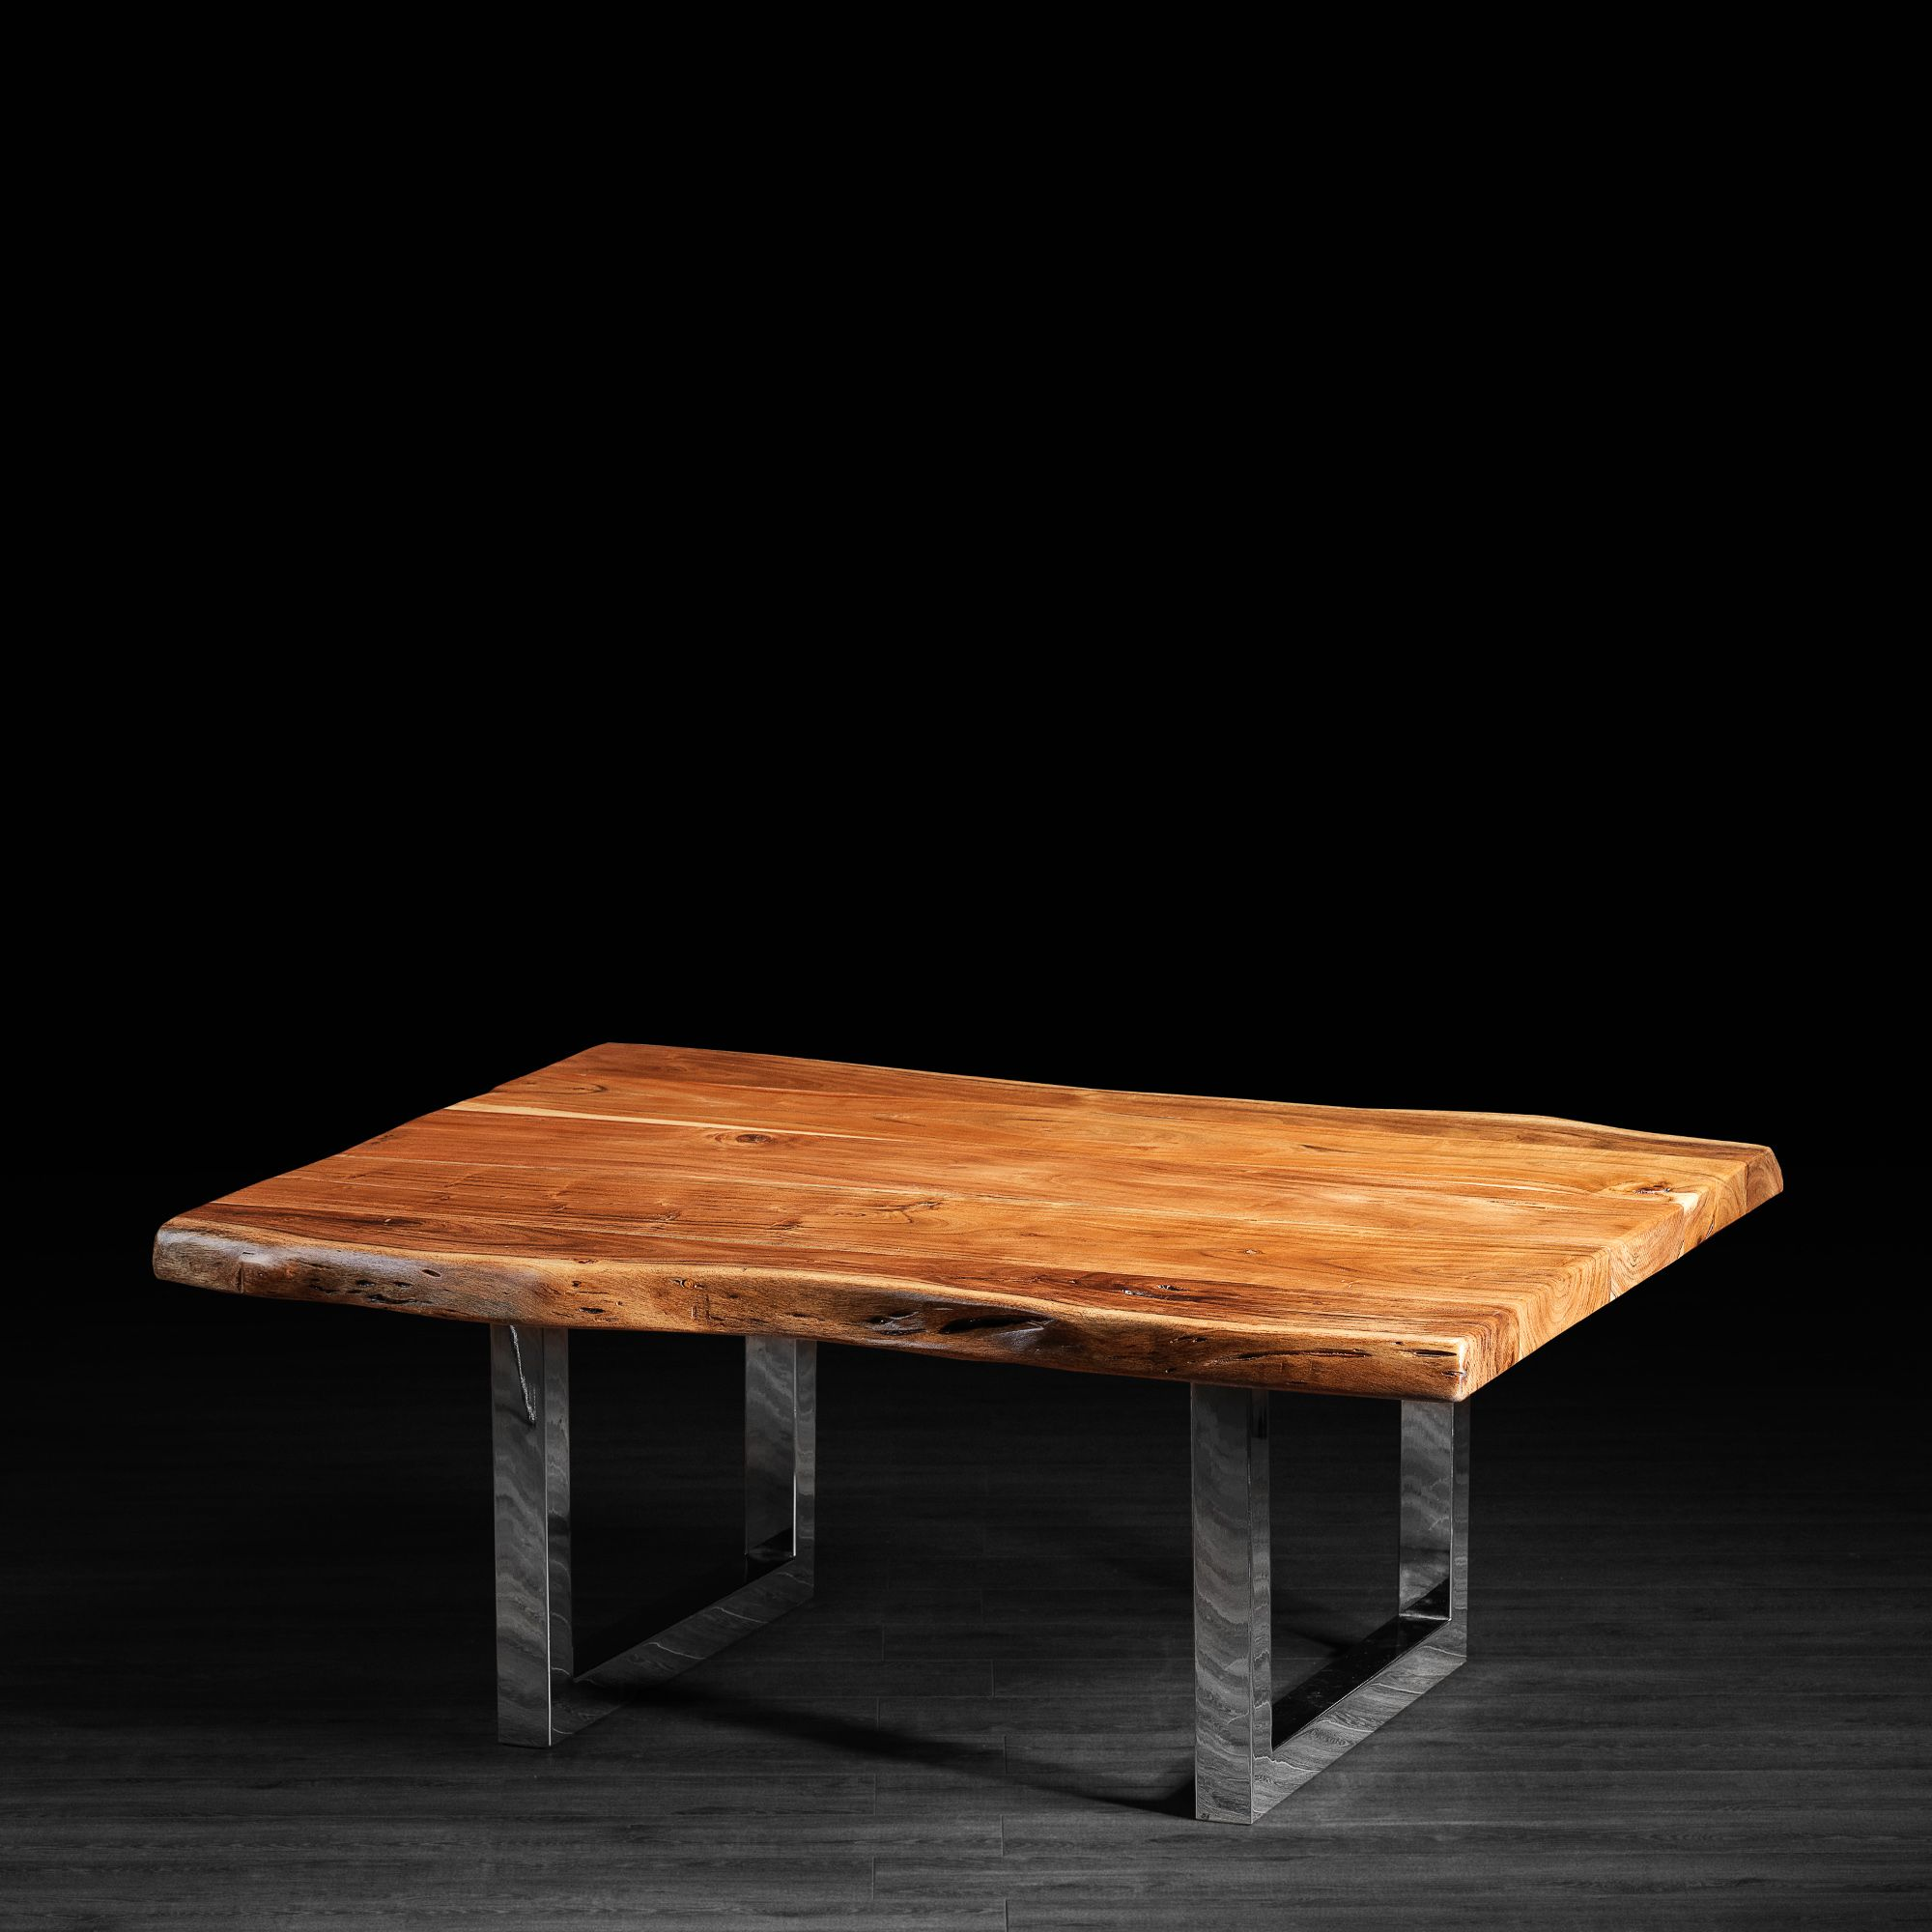 Freeform Coffee Table Made Of Acacia Coffee Table Wood Coffee Table Solid Wood Coffee Table [ 2000 x 2000 Pixel ]